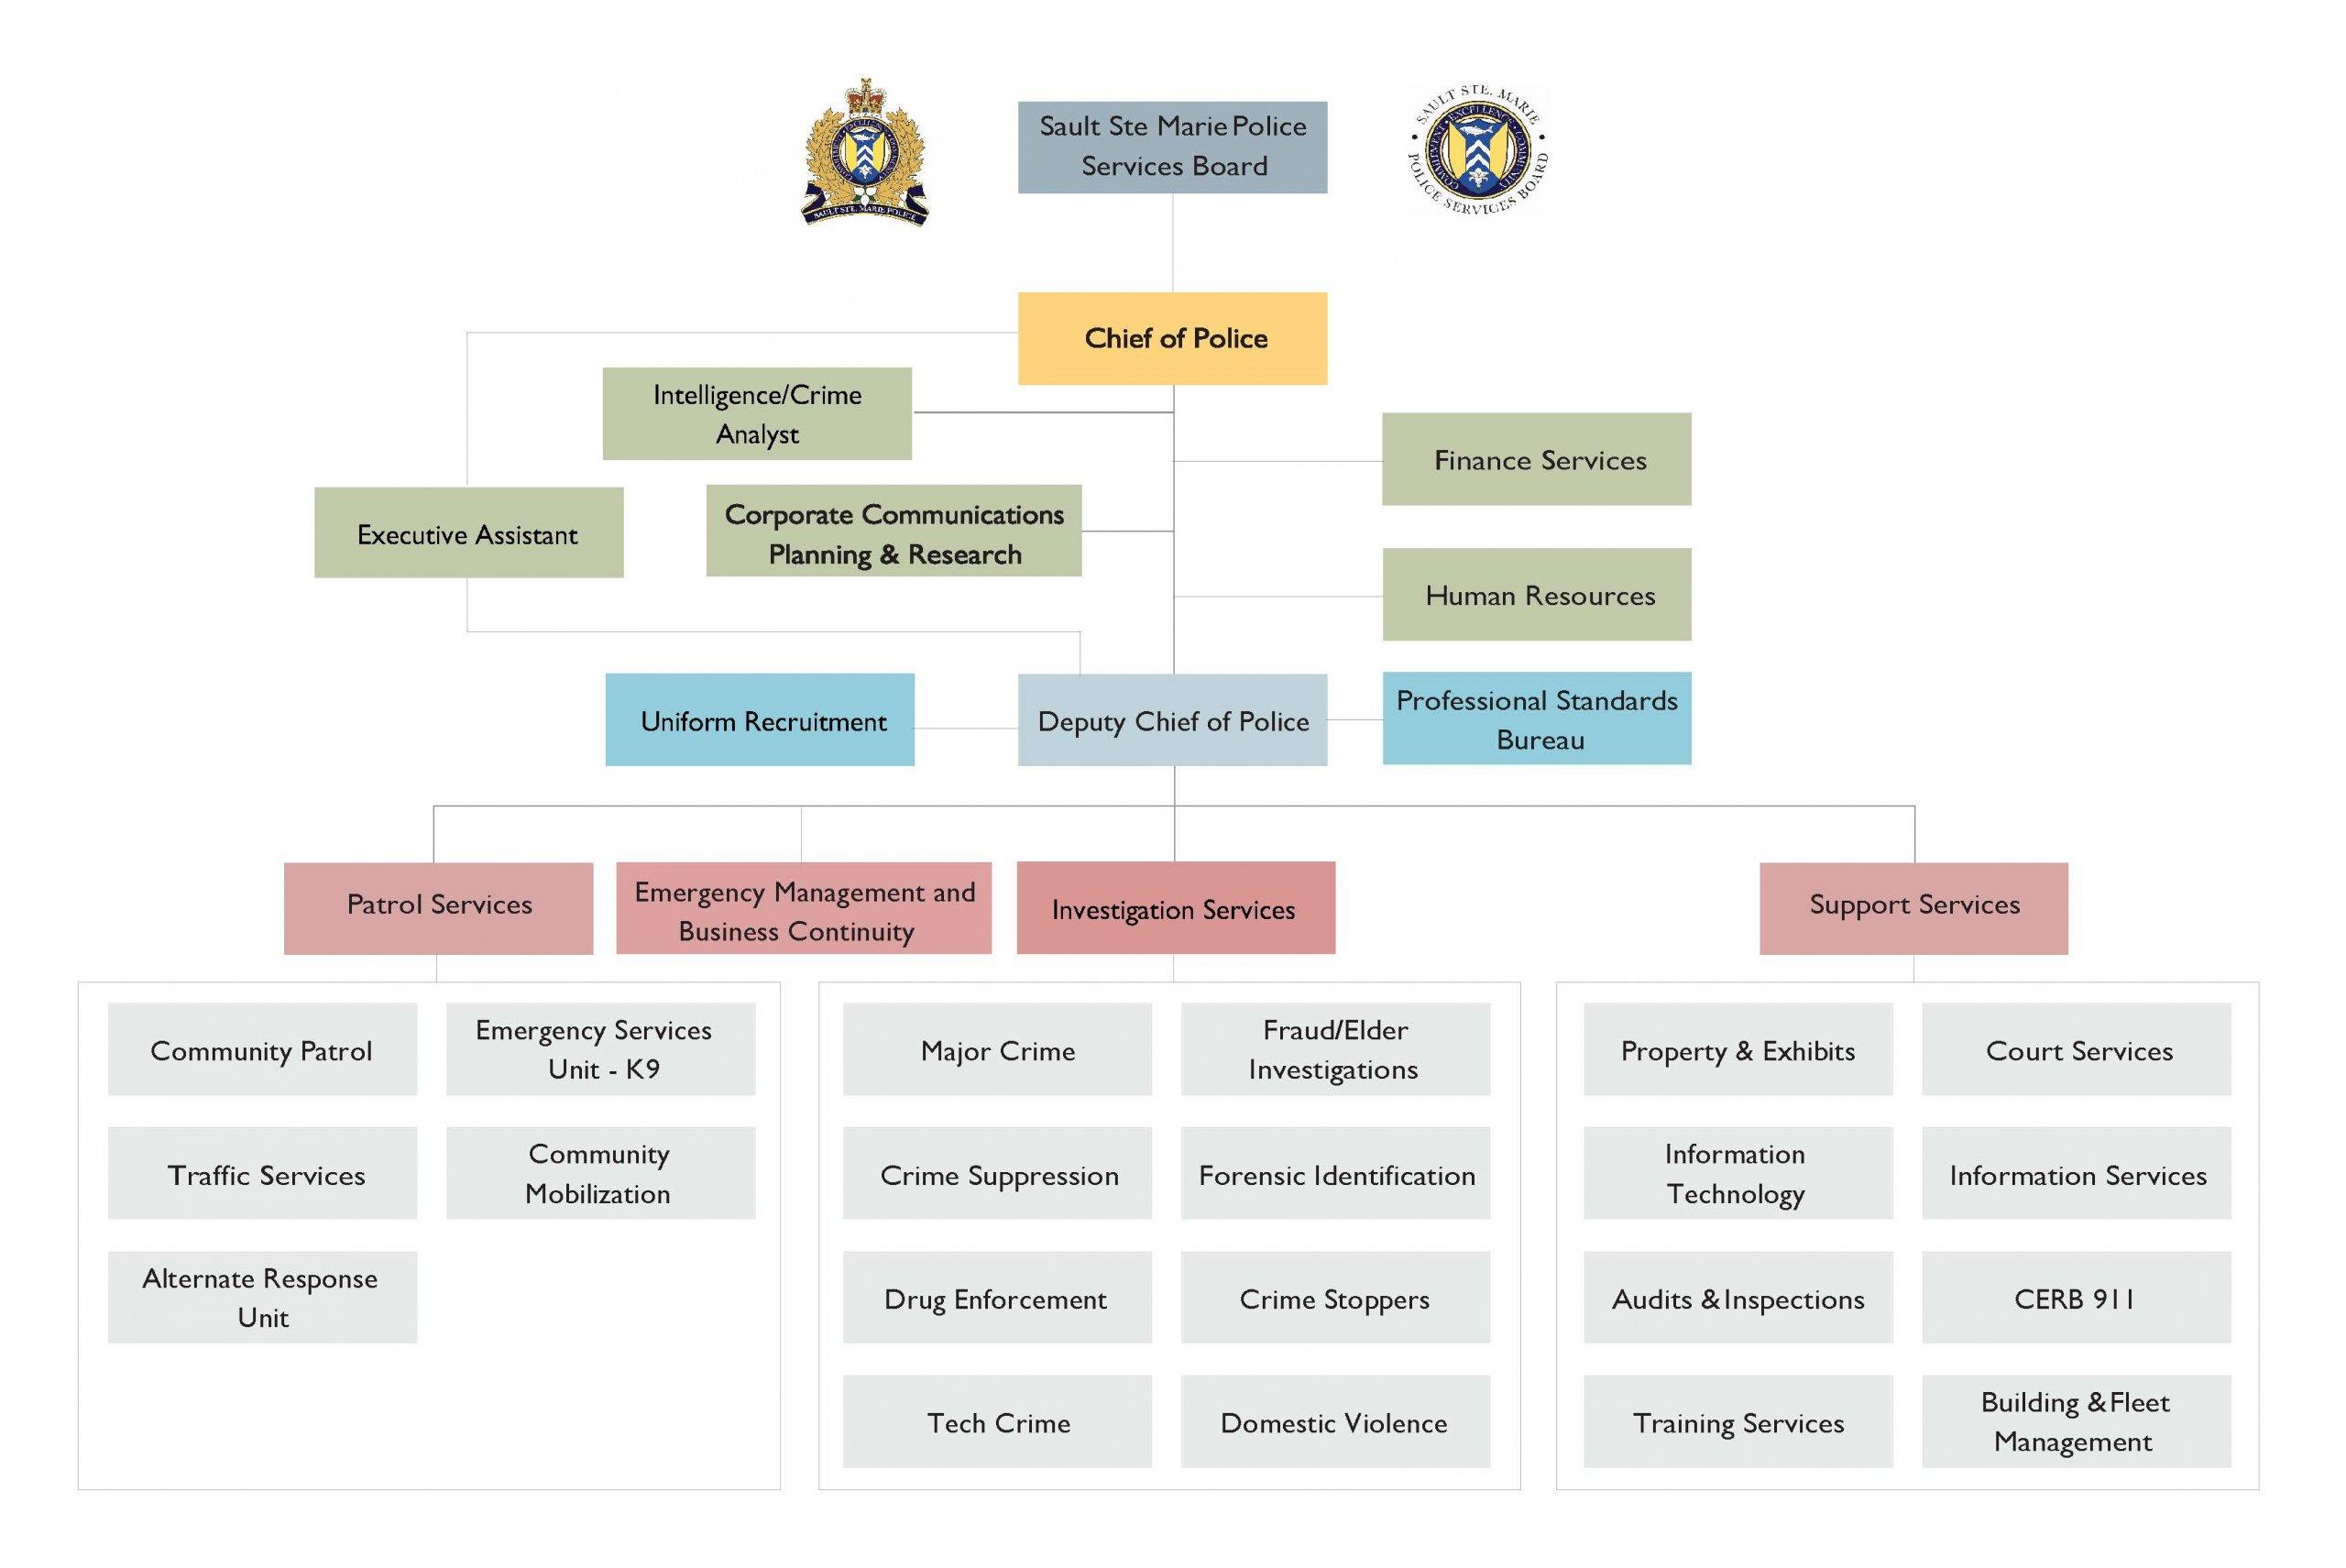 Organization Chart - Revised June 29, 2020